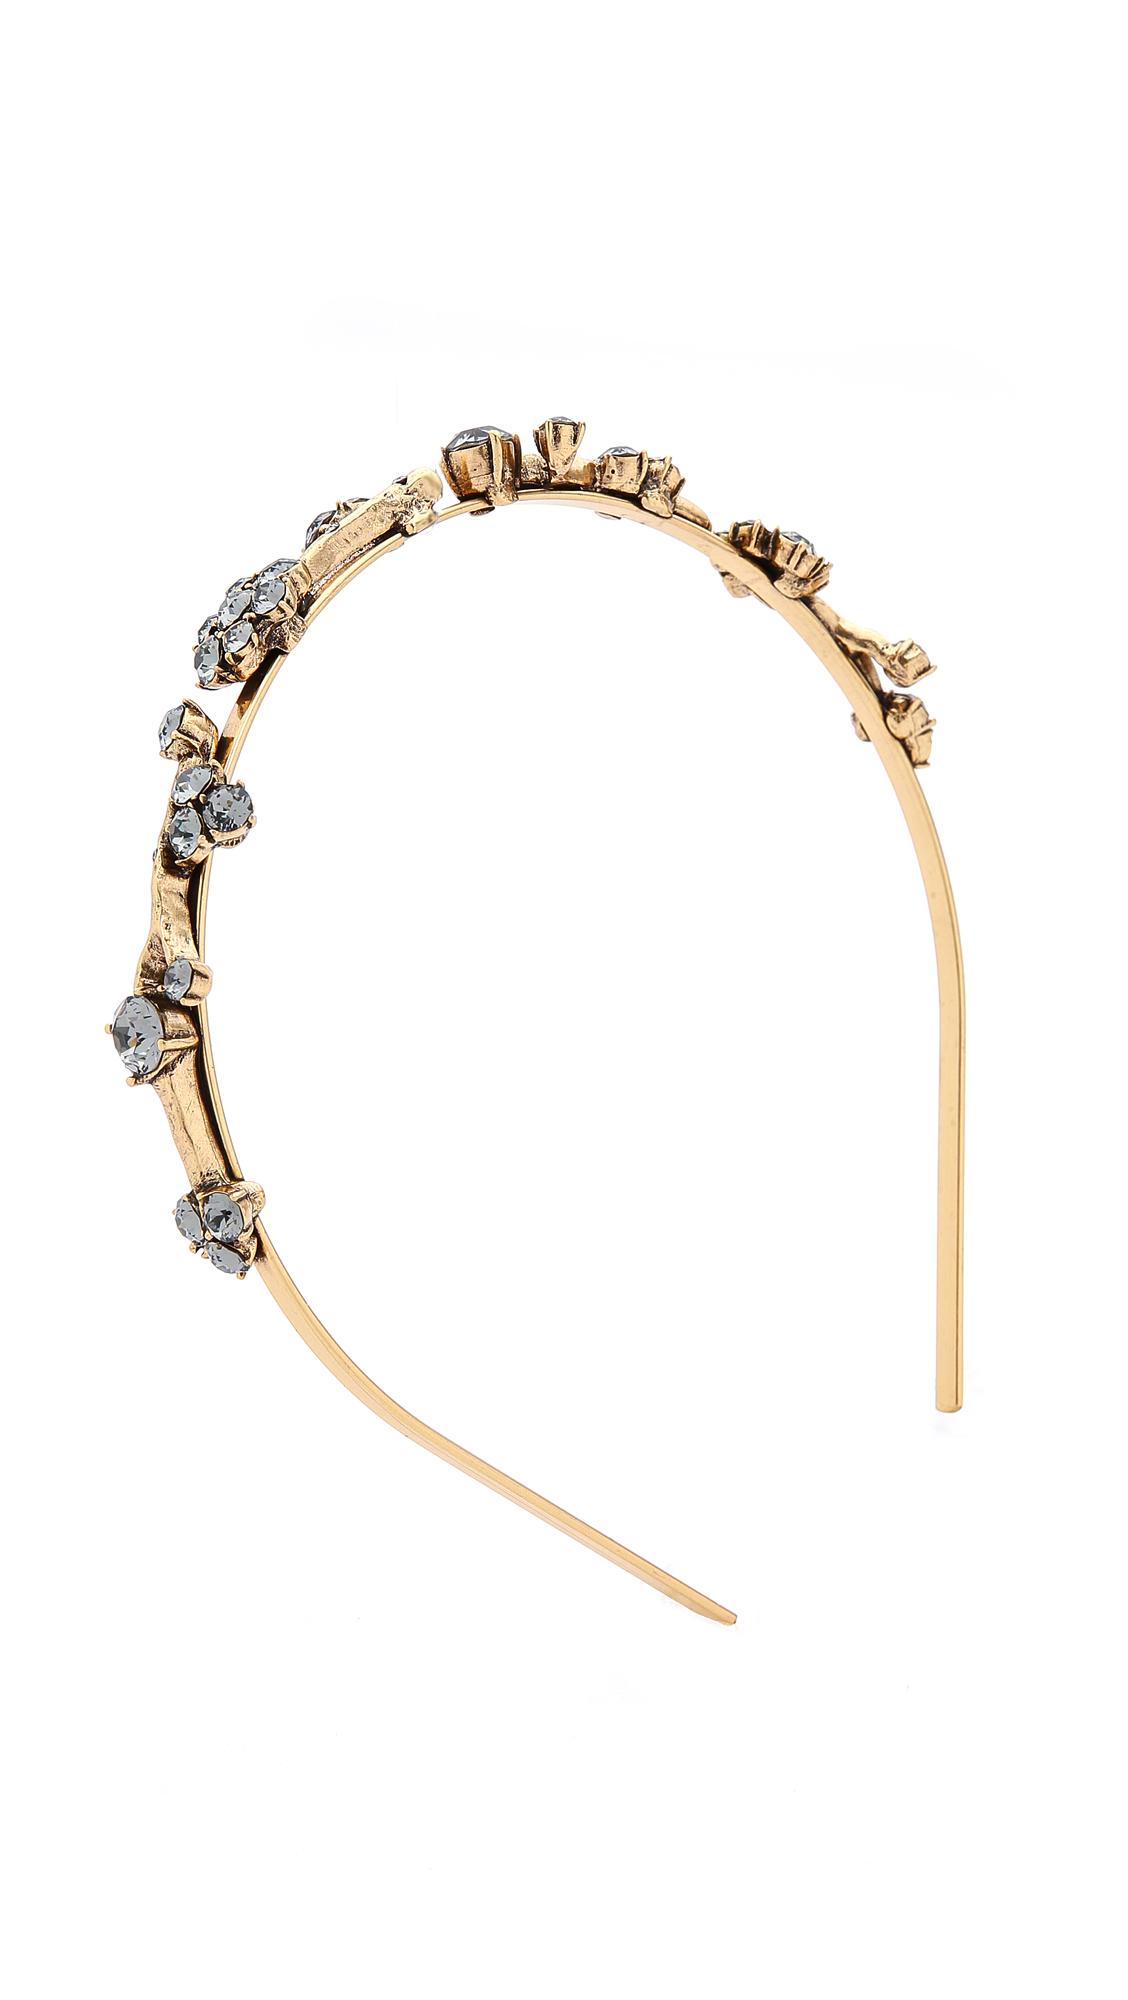 Lyst - Oscar de la Renta Crystal Branch Headband - Black Diamond in ... 4cf3b4908af